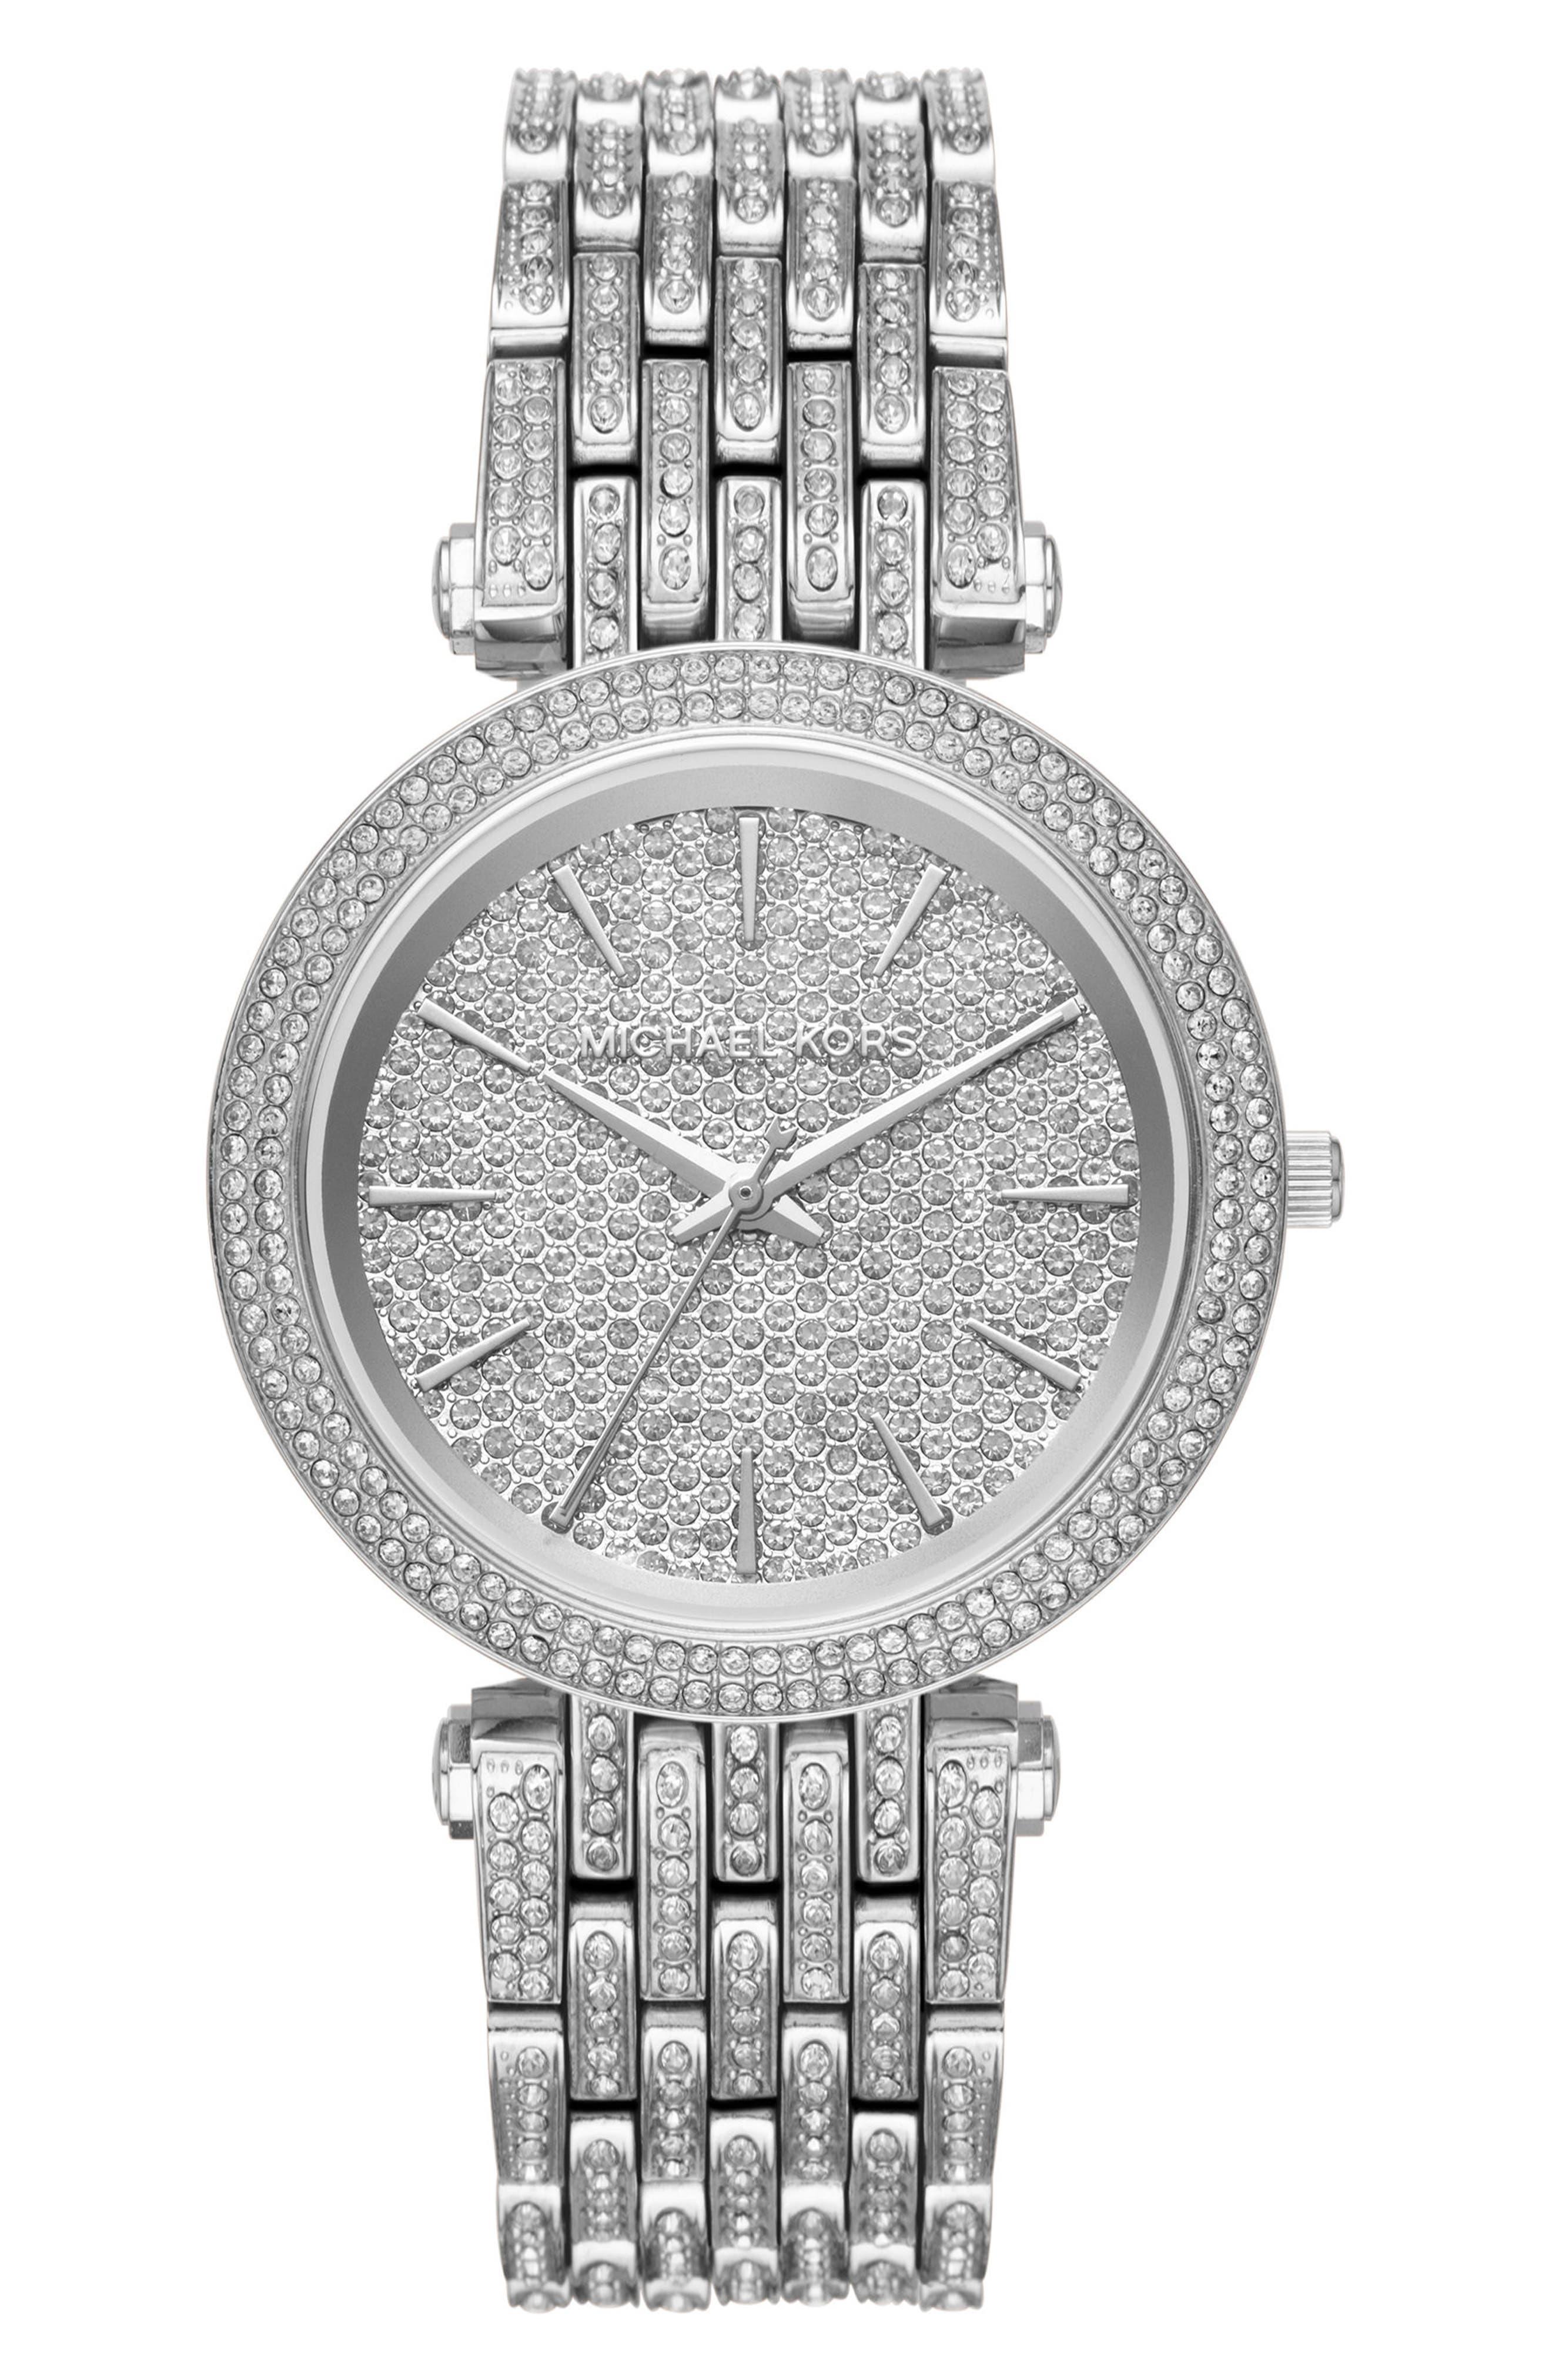 Main Image - Michael Kors Darci Crystal Bezel Braclet Watch, 39mm